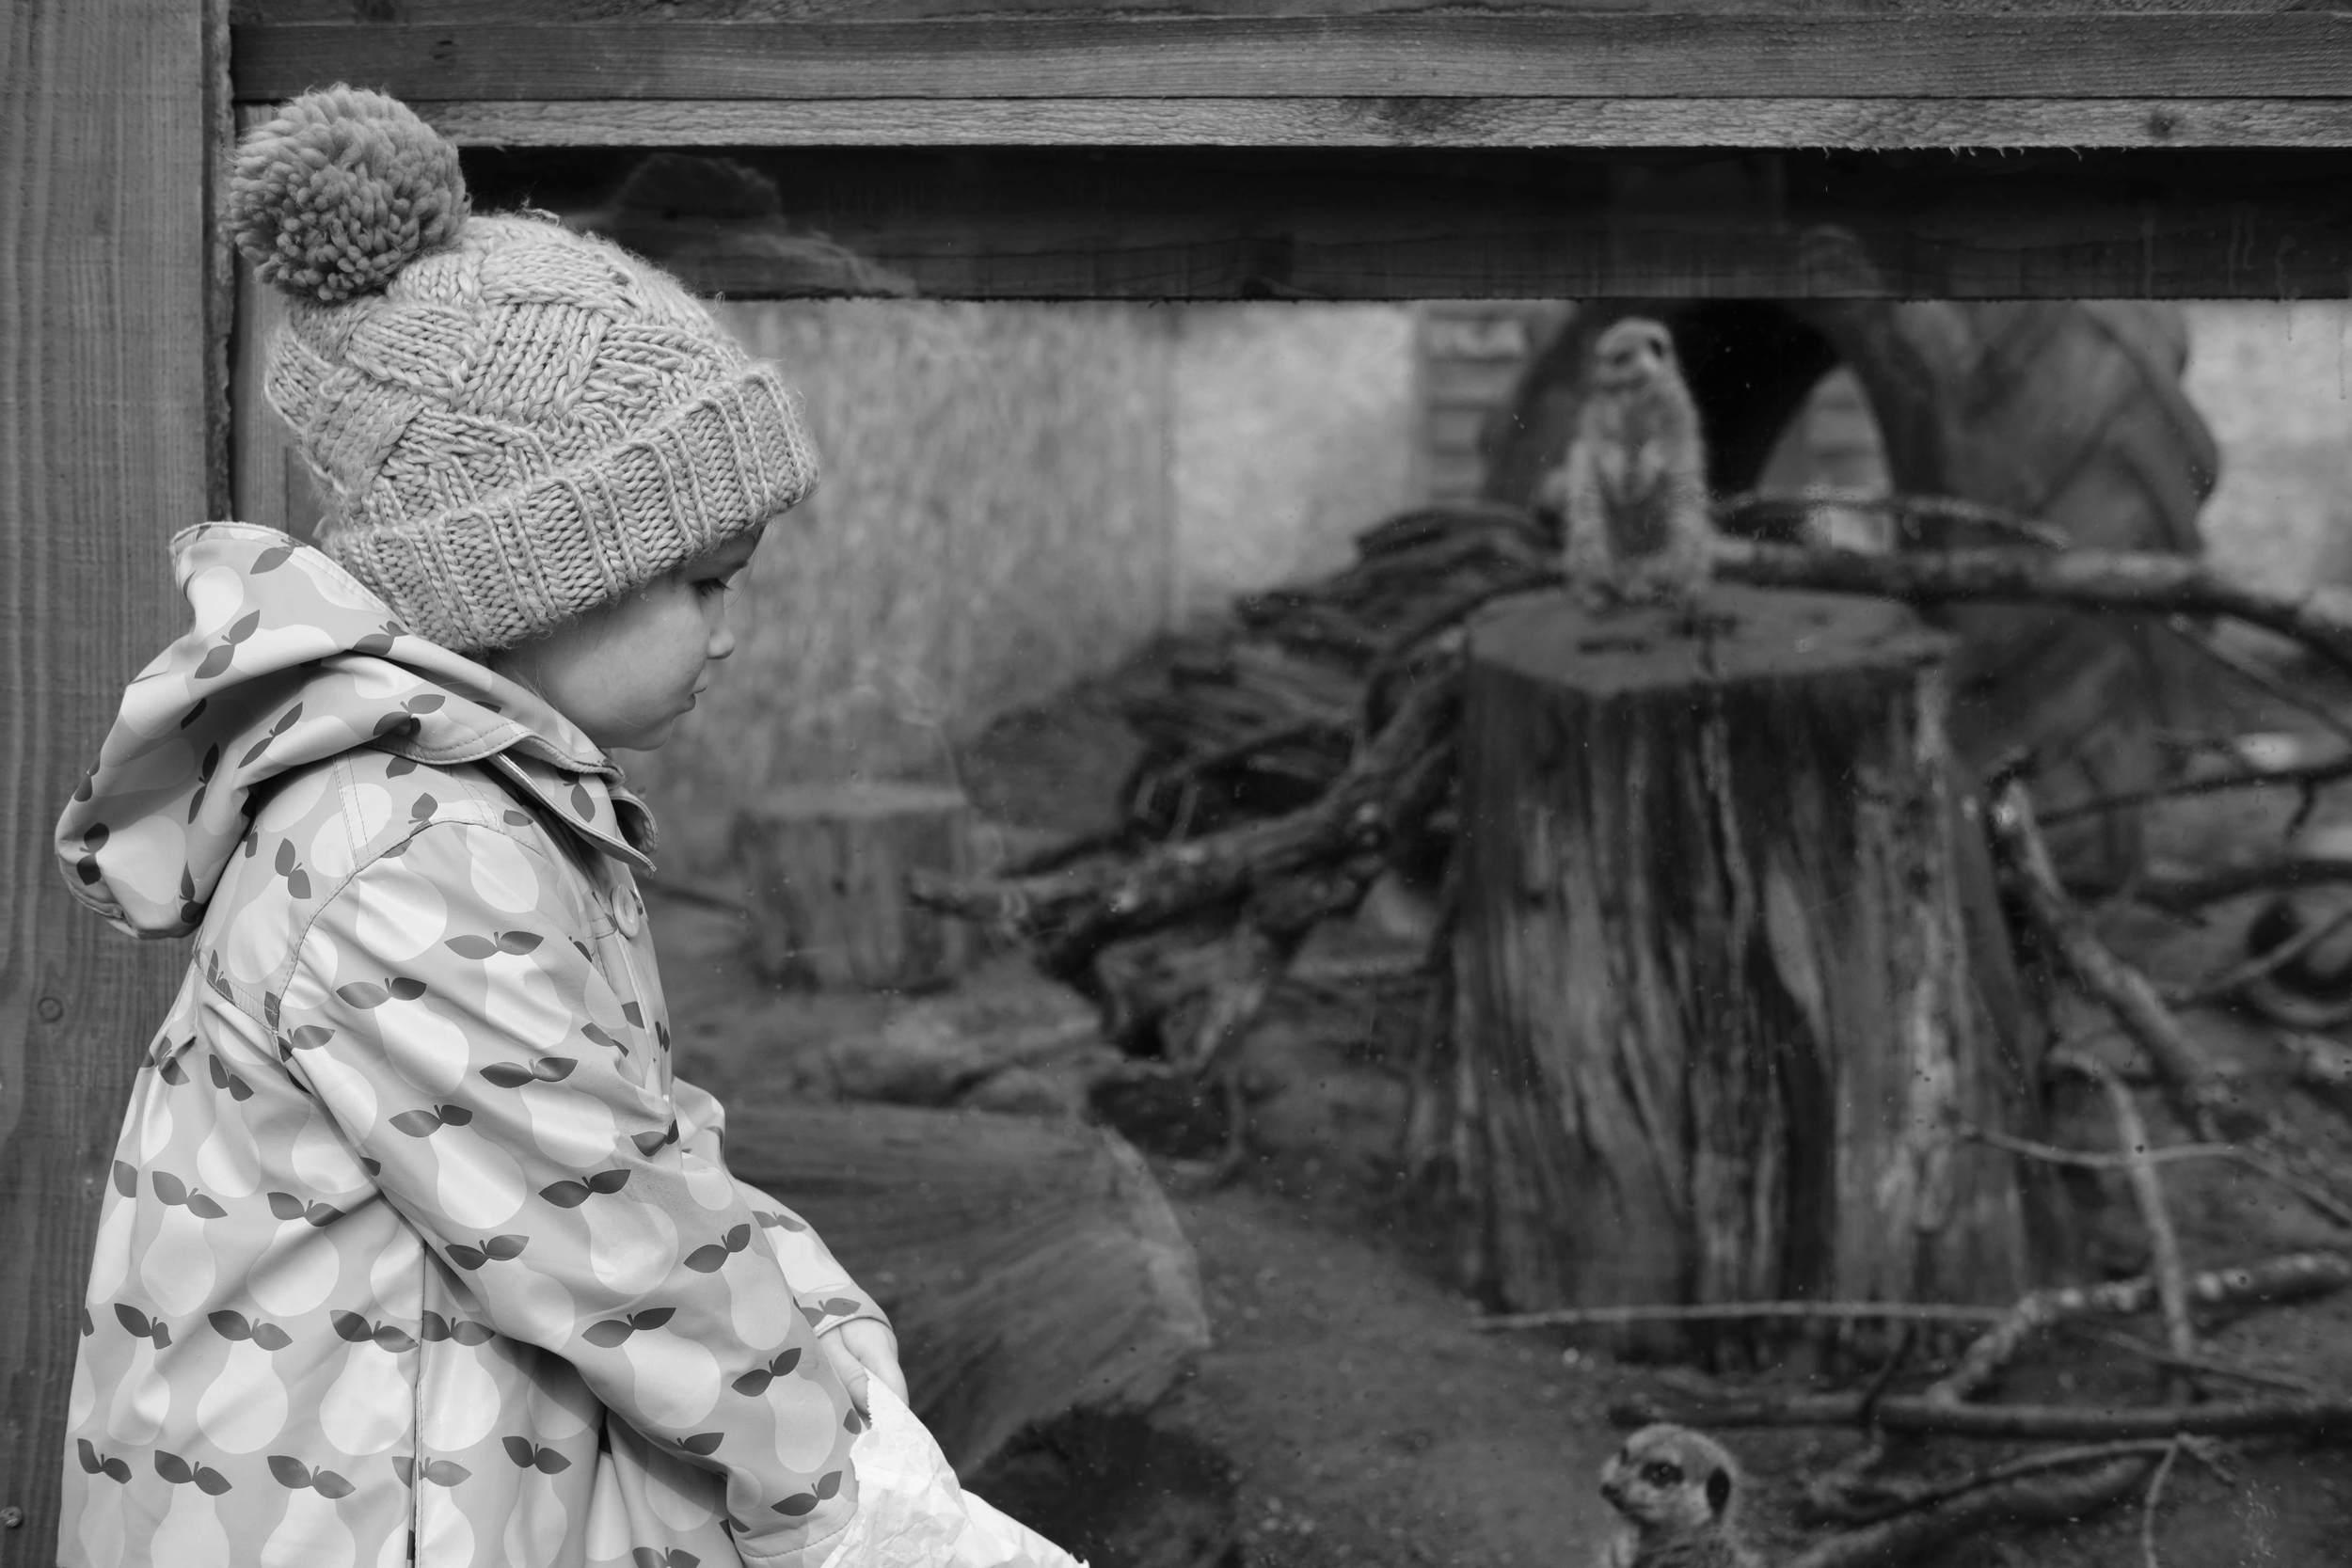 Audrey outside Meerkat enclosure at Eshottheugh Animal Park, Northumberland